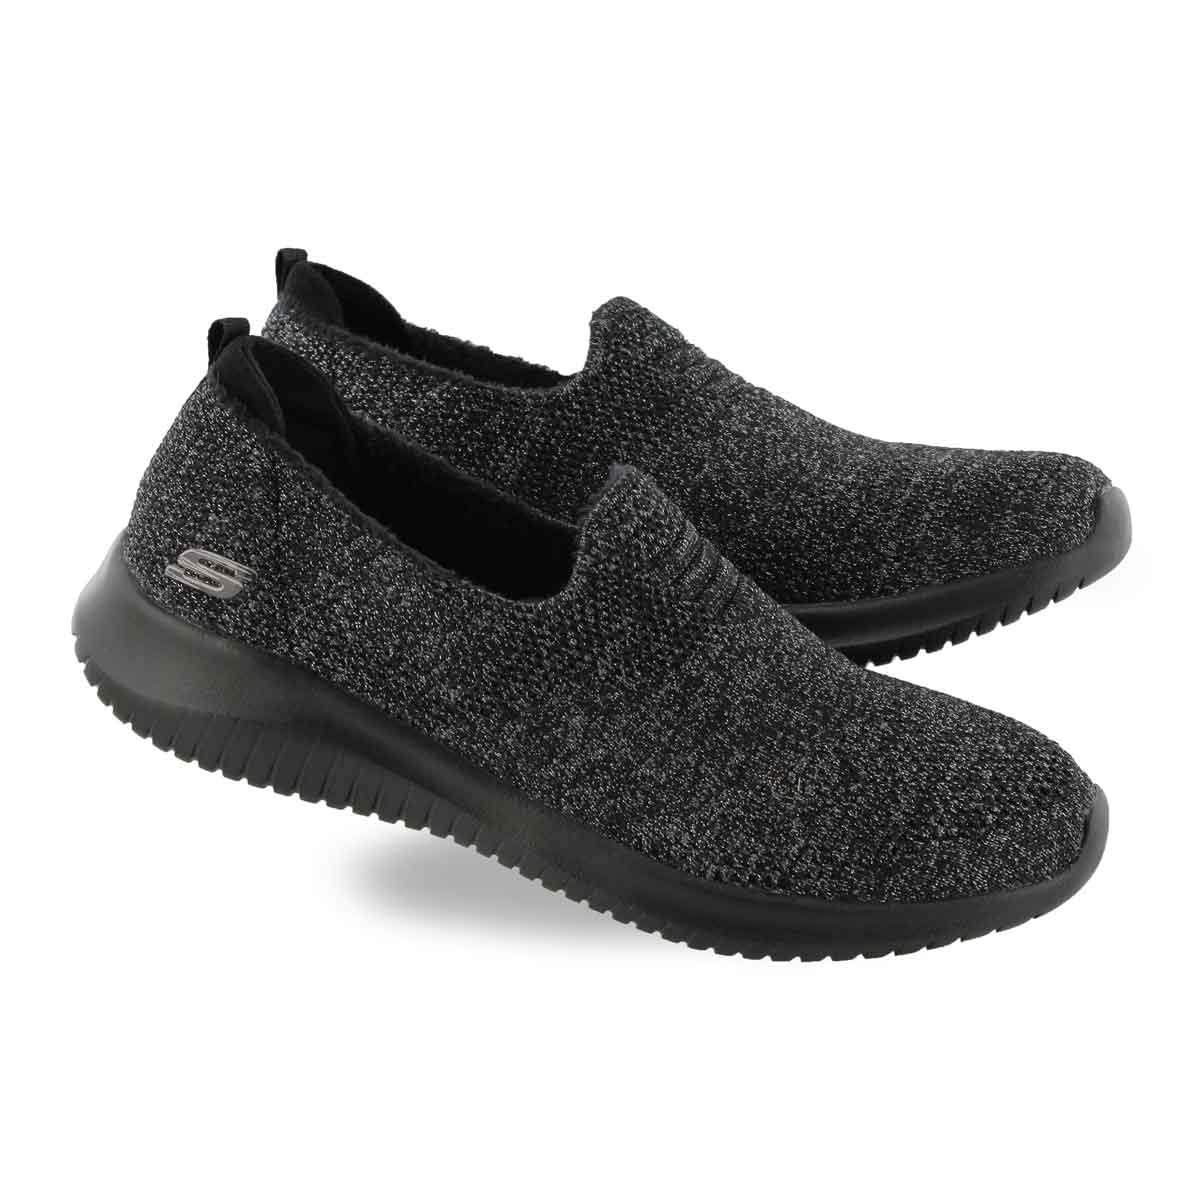 Lds Ultra Flex blk/char slip on sneaker